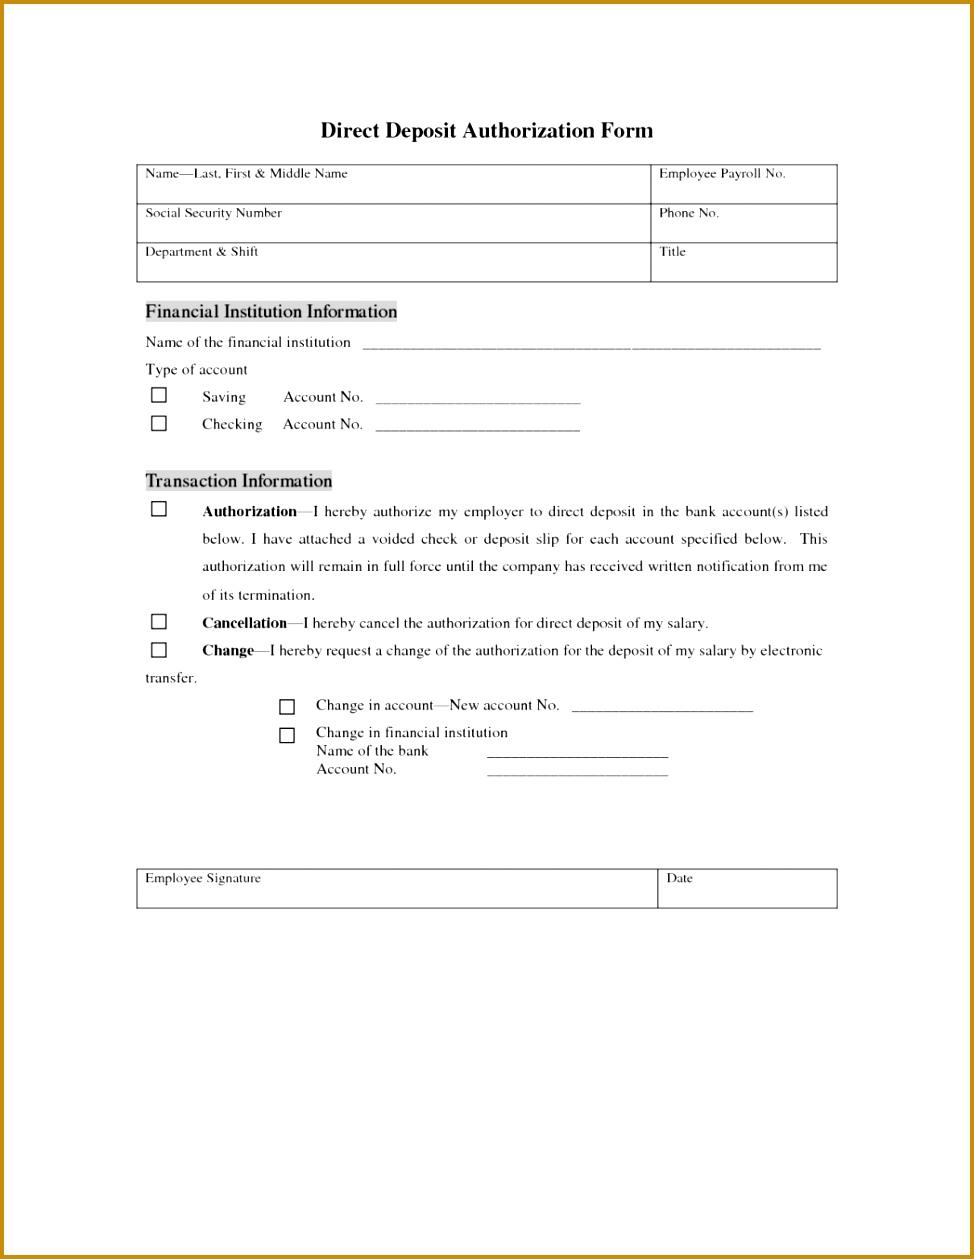 8 Direct Deposit Authorization Form Letter Template Free 1292 Direct Deposit Form Template Form 1259974